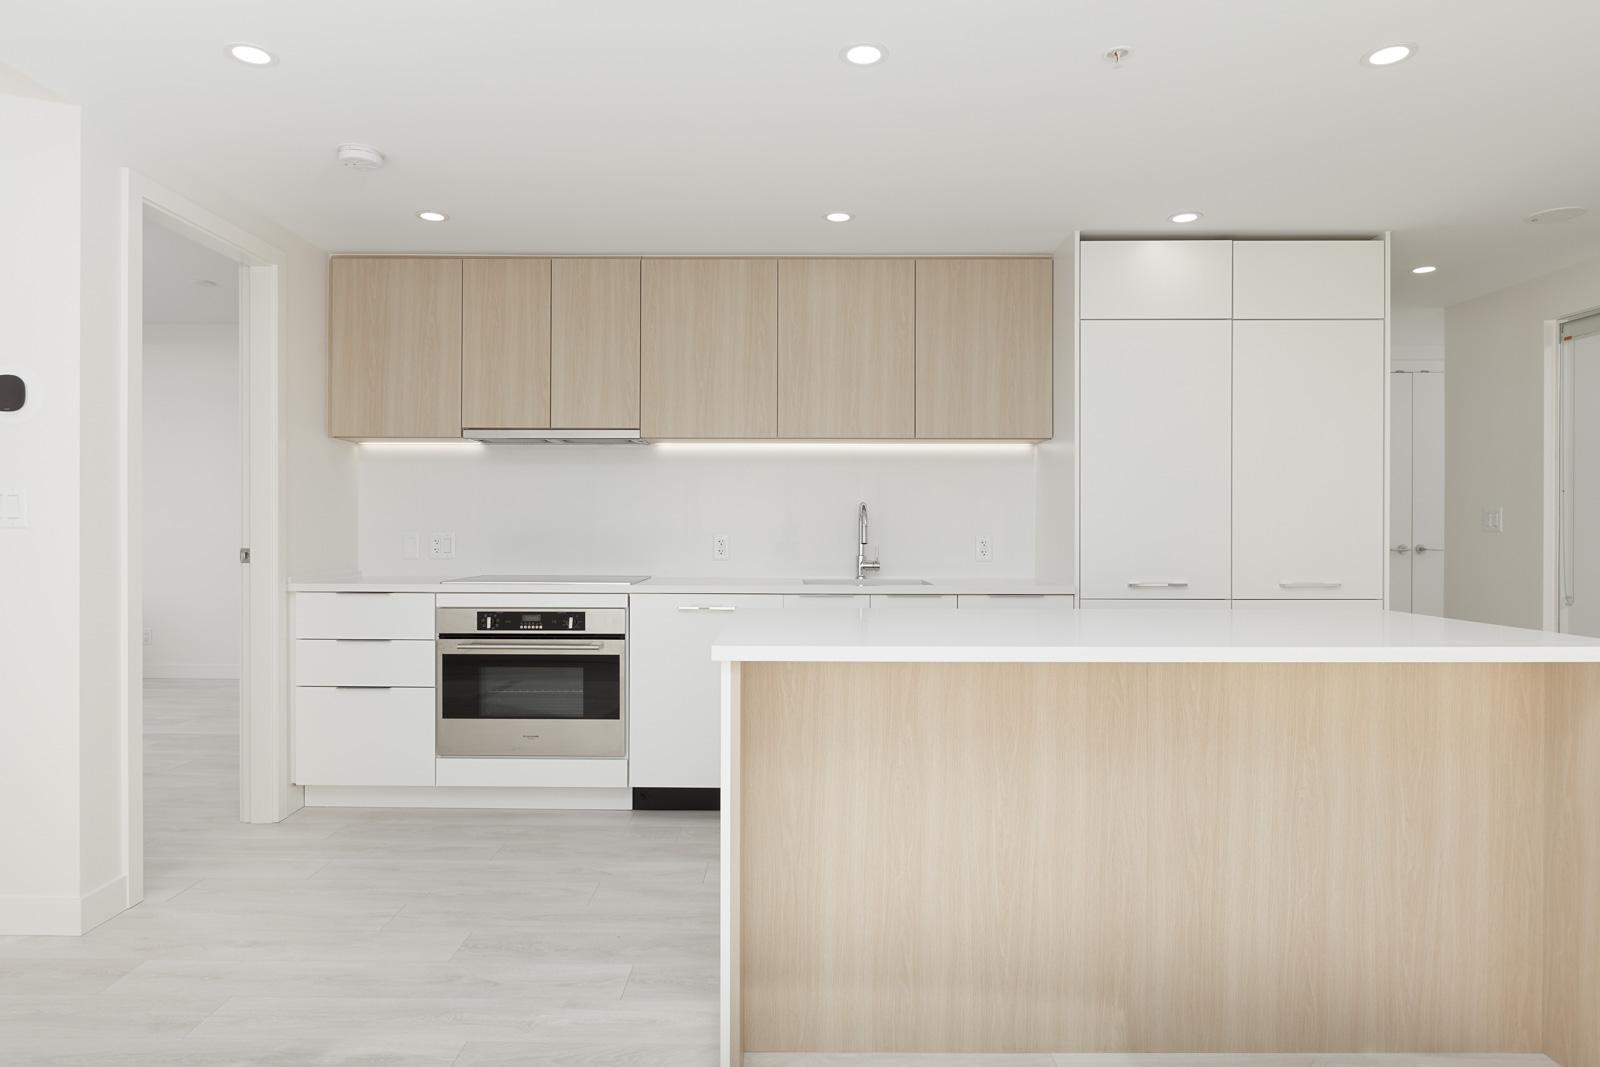 kitchen in rental condo with Birds Nest Properties property management in Surrey